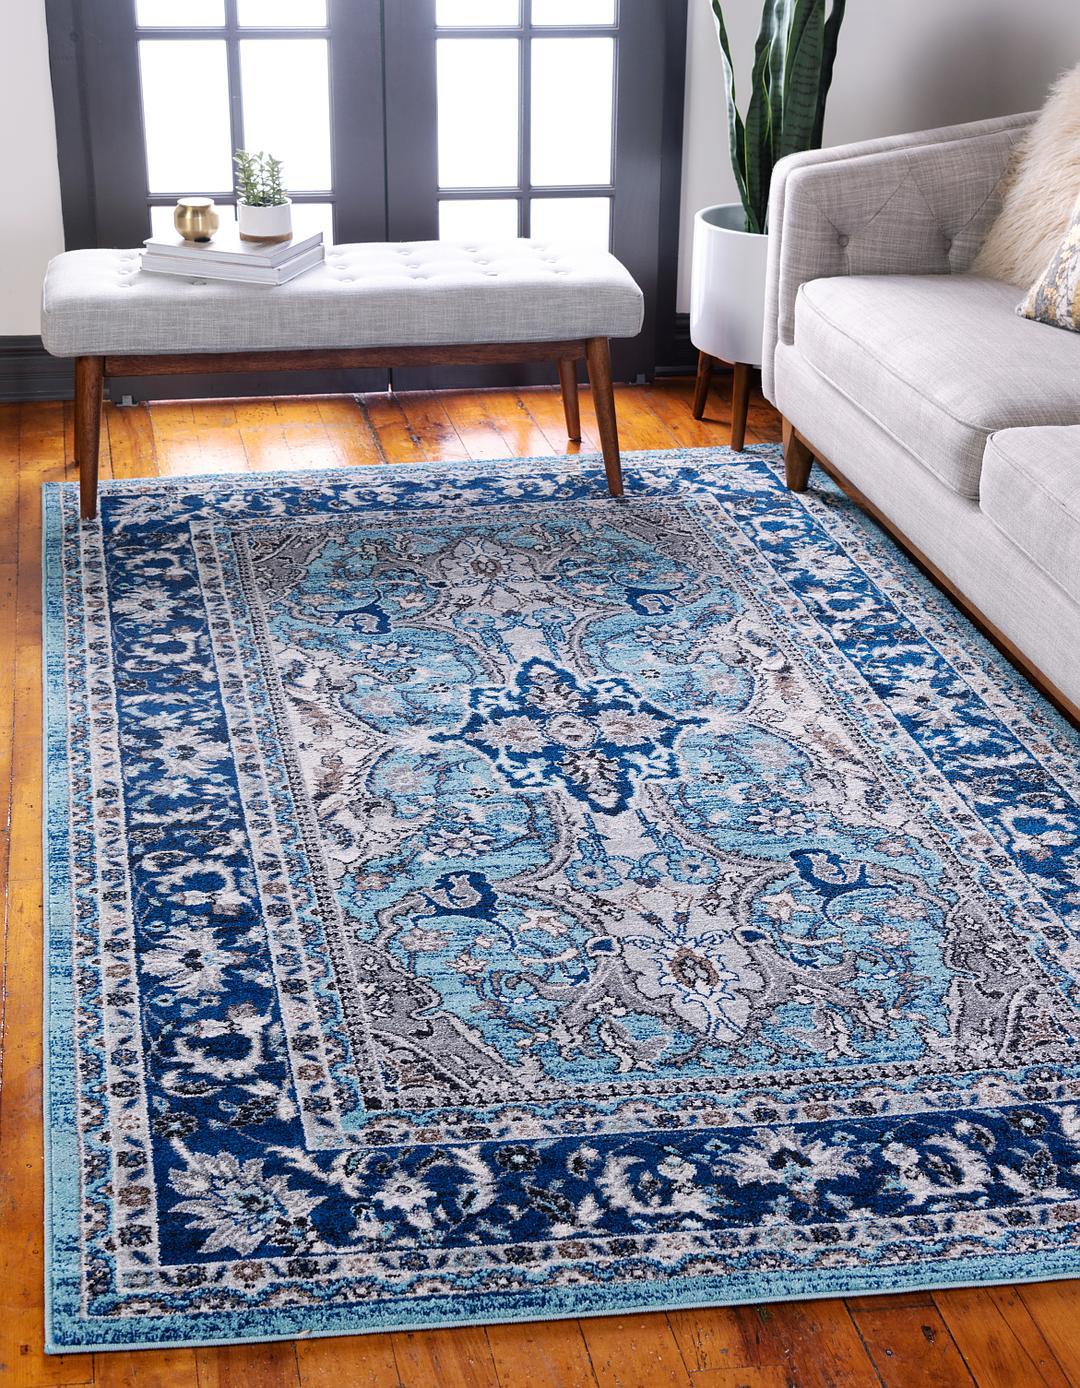 blue 9 39 x 12 39 heritage rug area rugs. Black Bedroom Furniture Sets. Home Design Ideas